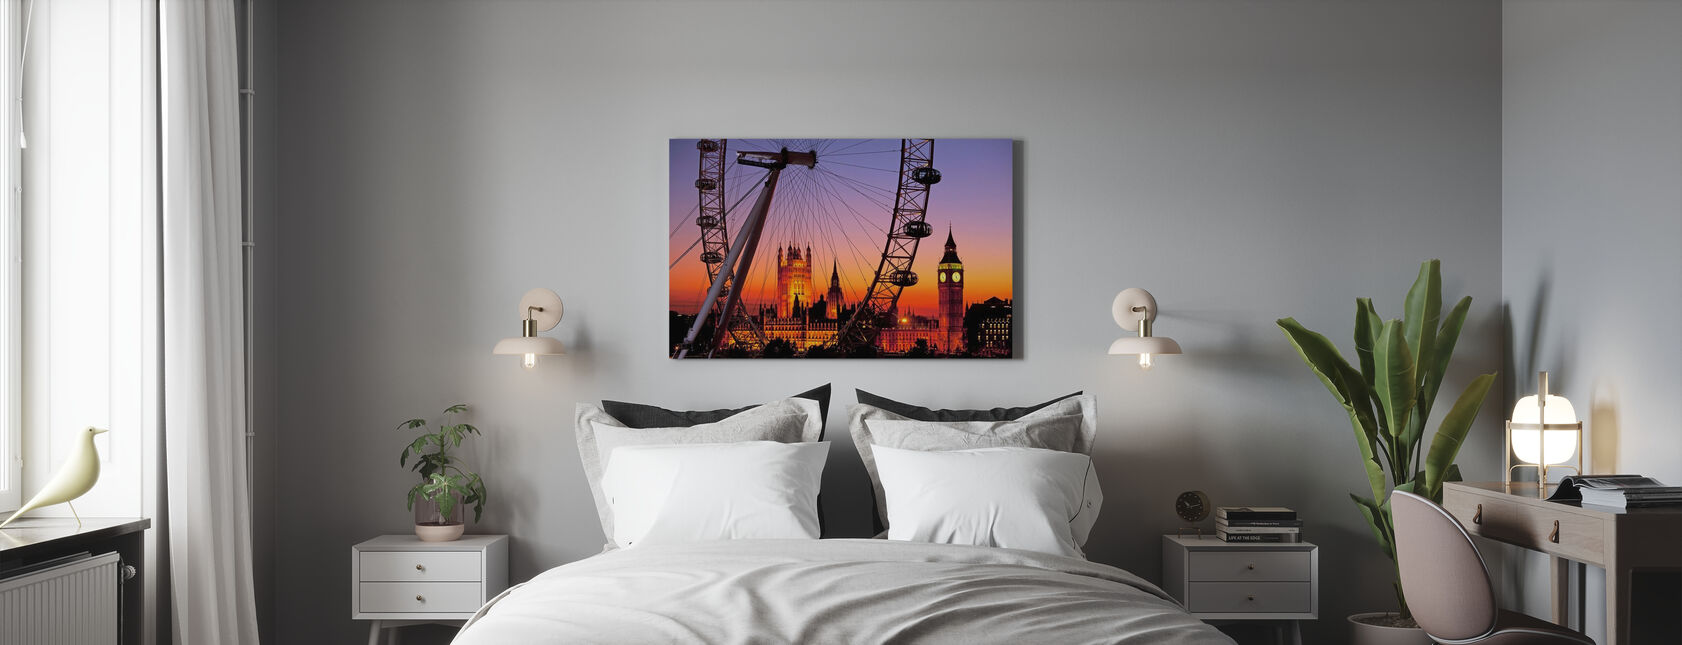 London Eye - Canvas print - Bedroom